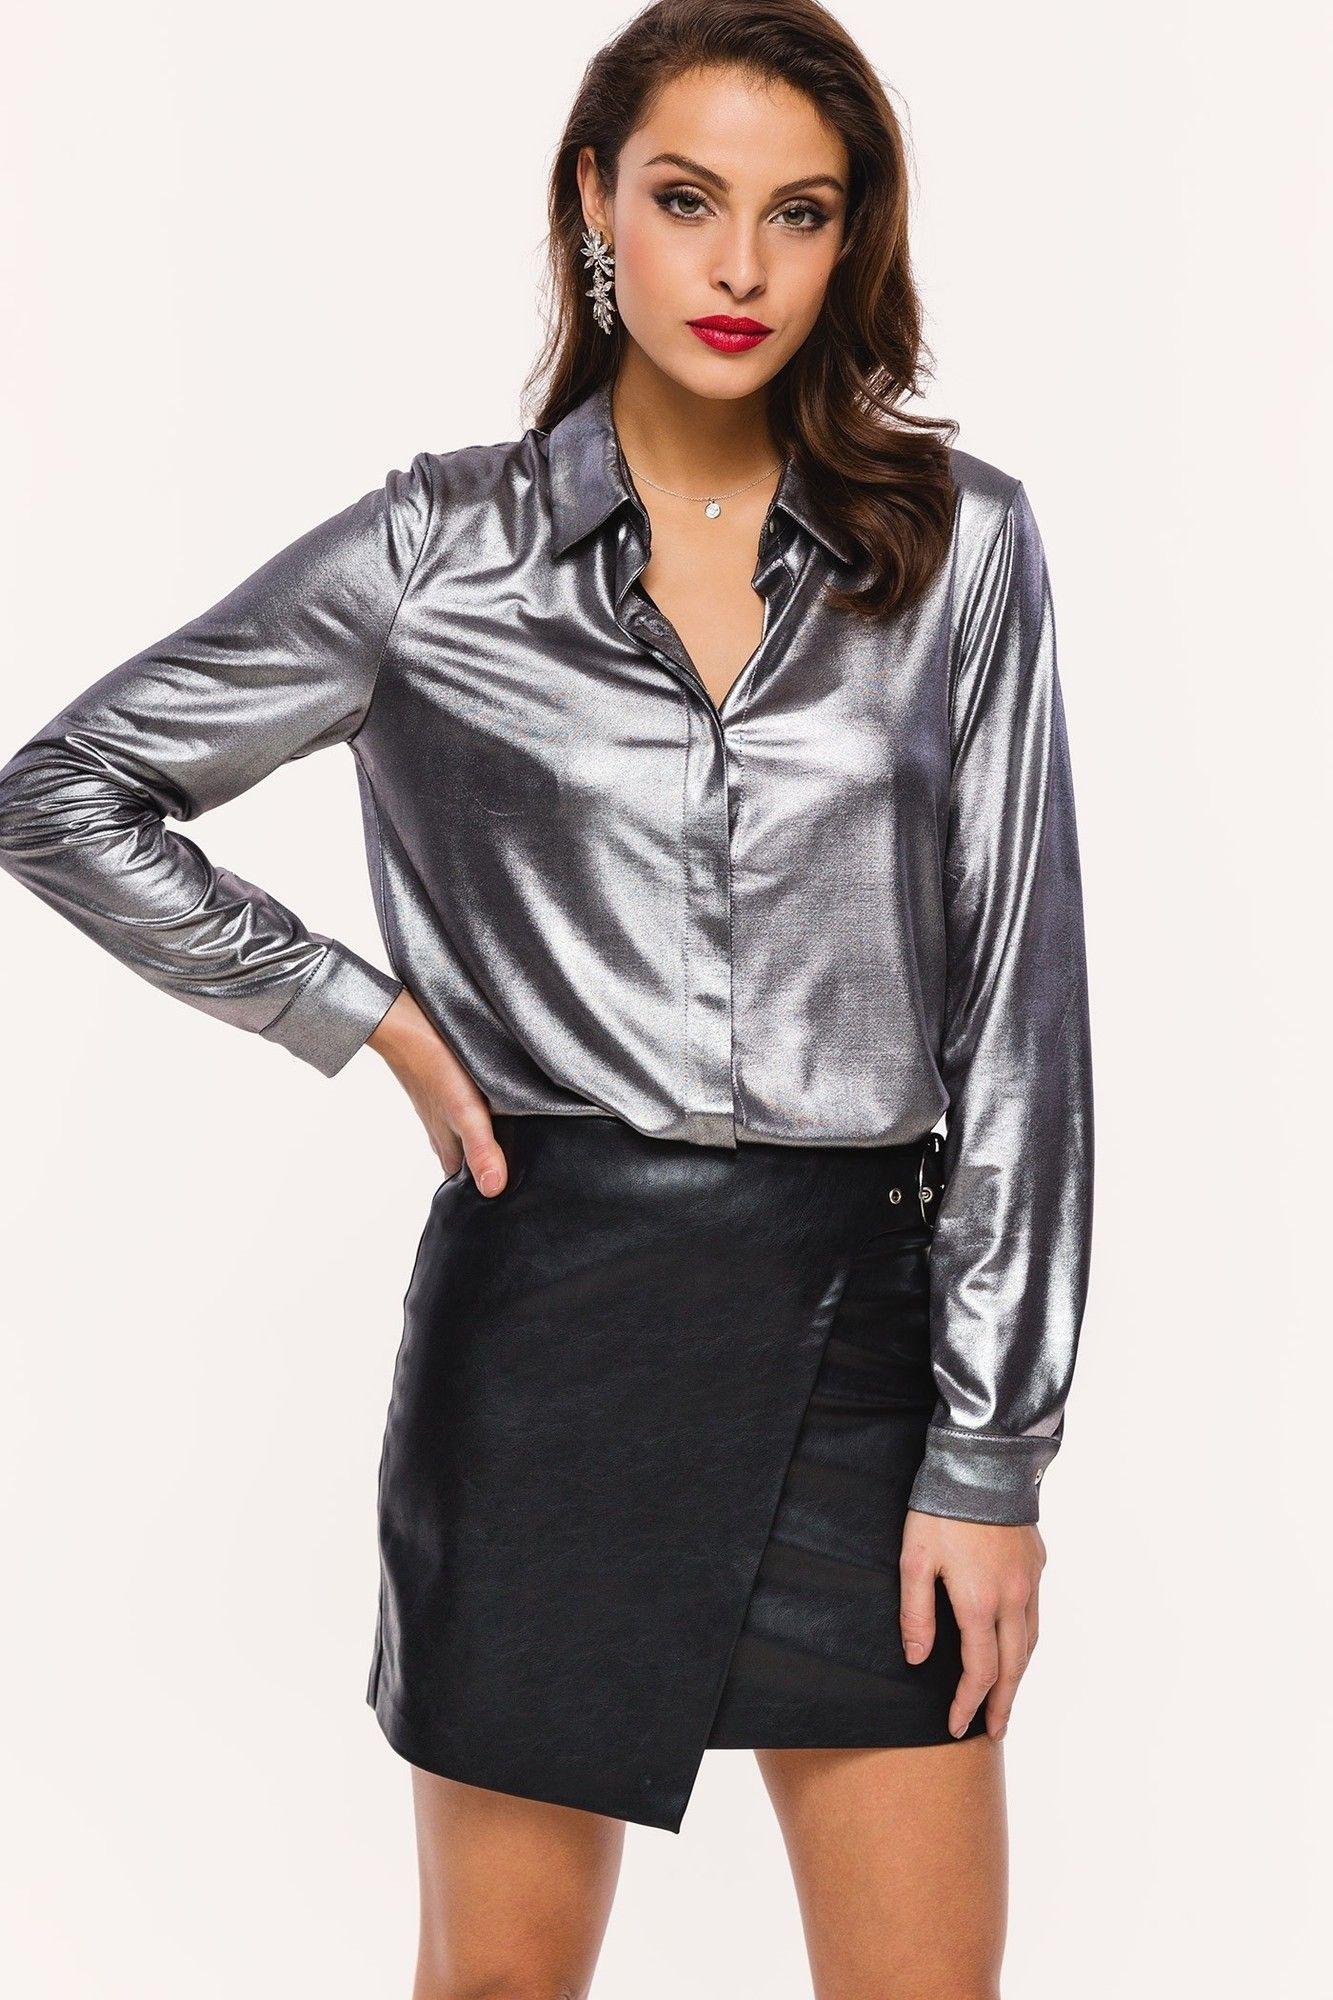 Loavies silver blouse | Fashion Webshop LOAVIES Blusen, Pvc Rock,  Lederhosen, Leder Outfits